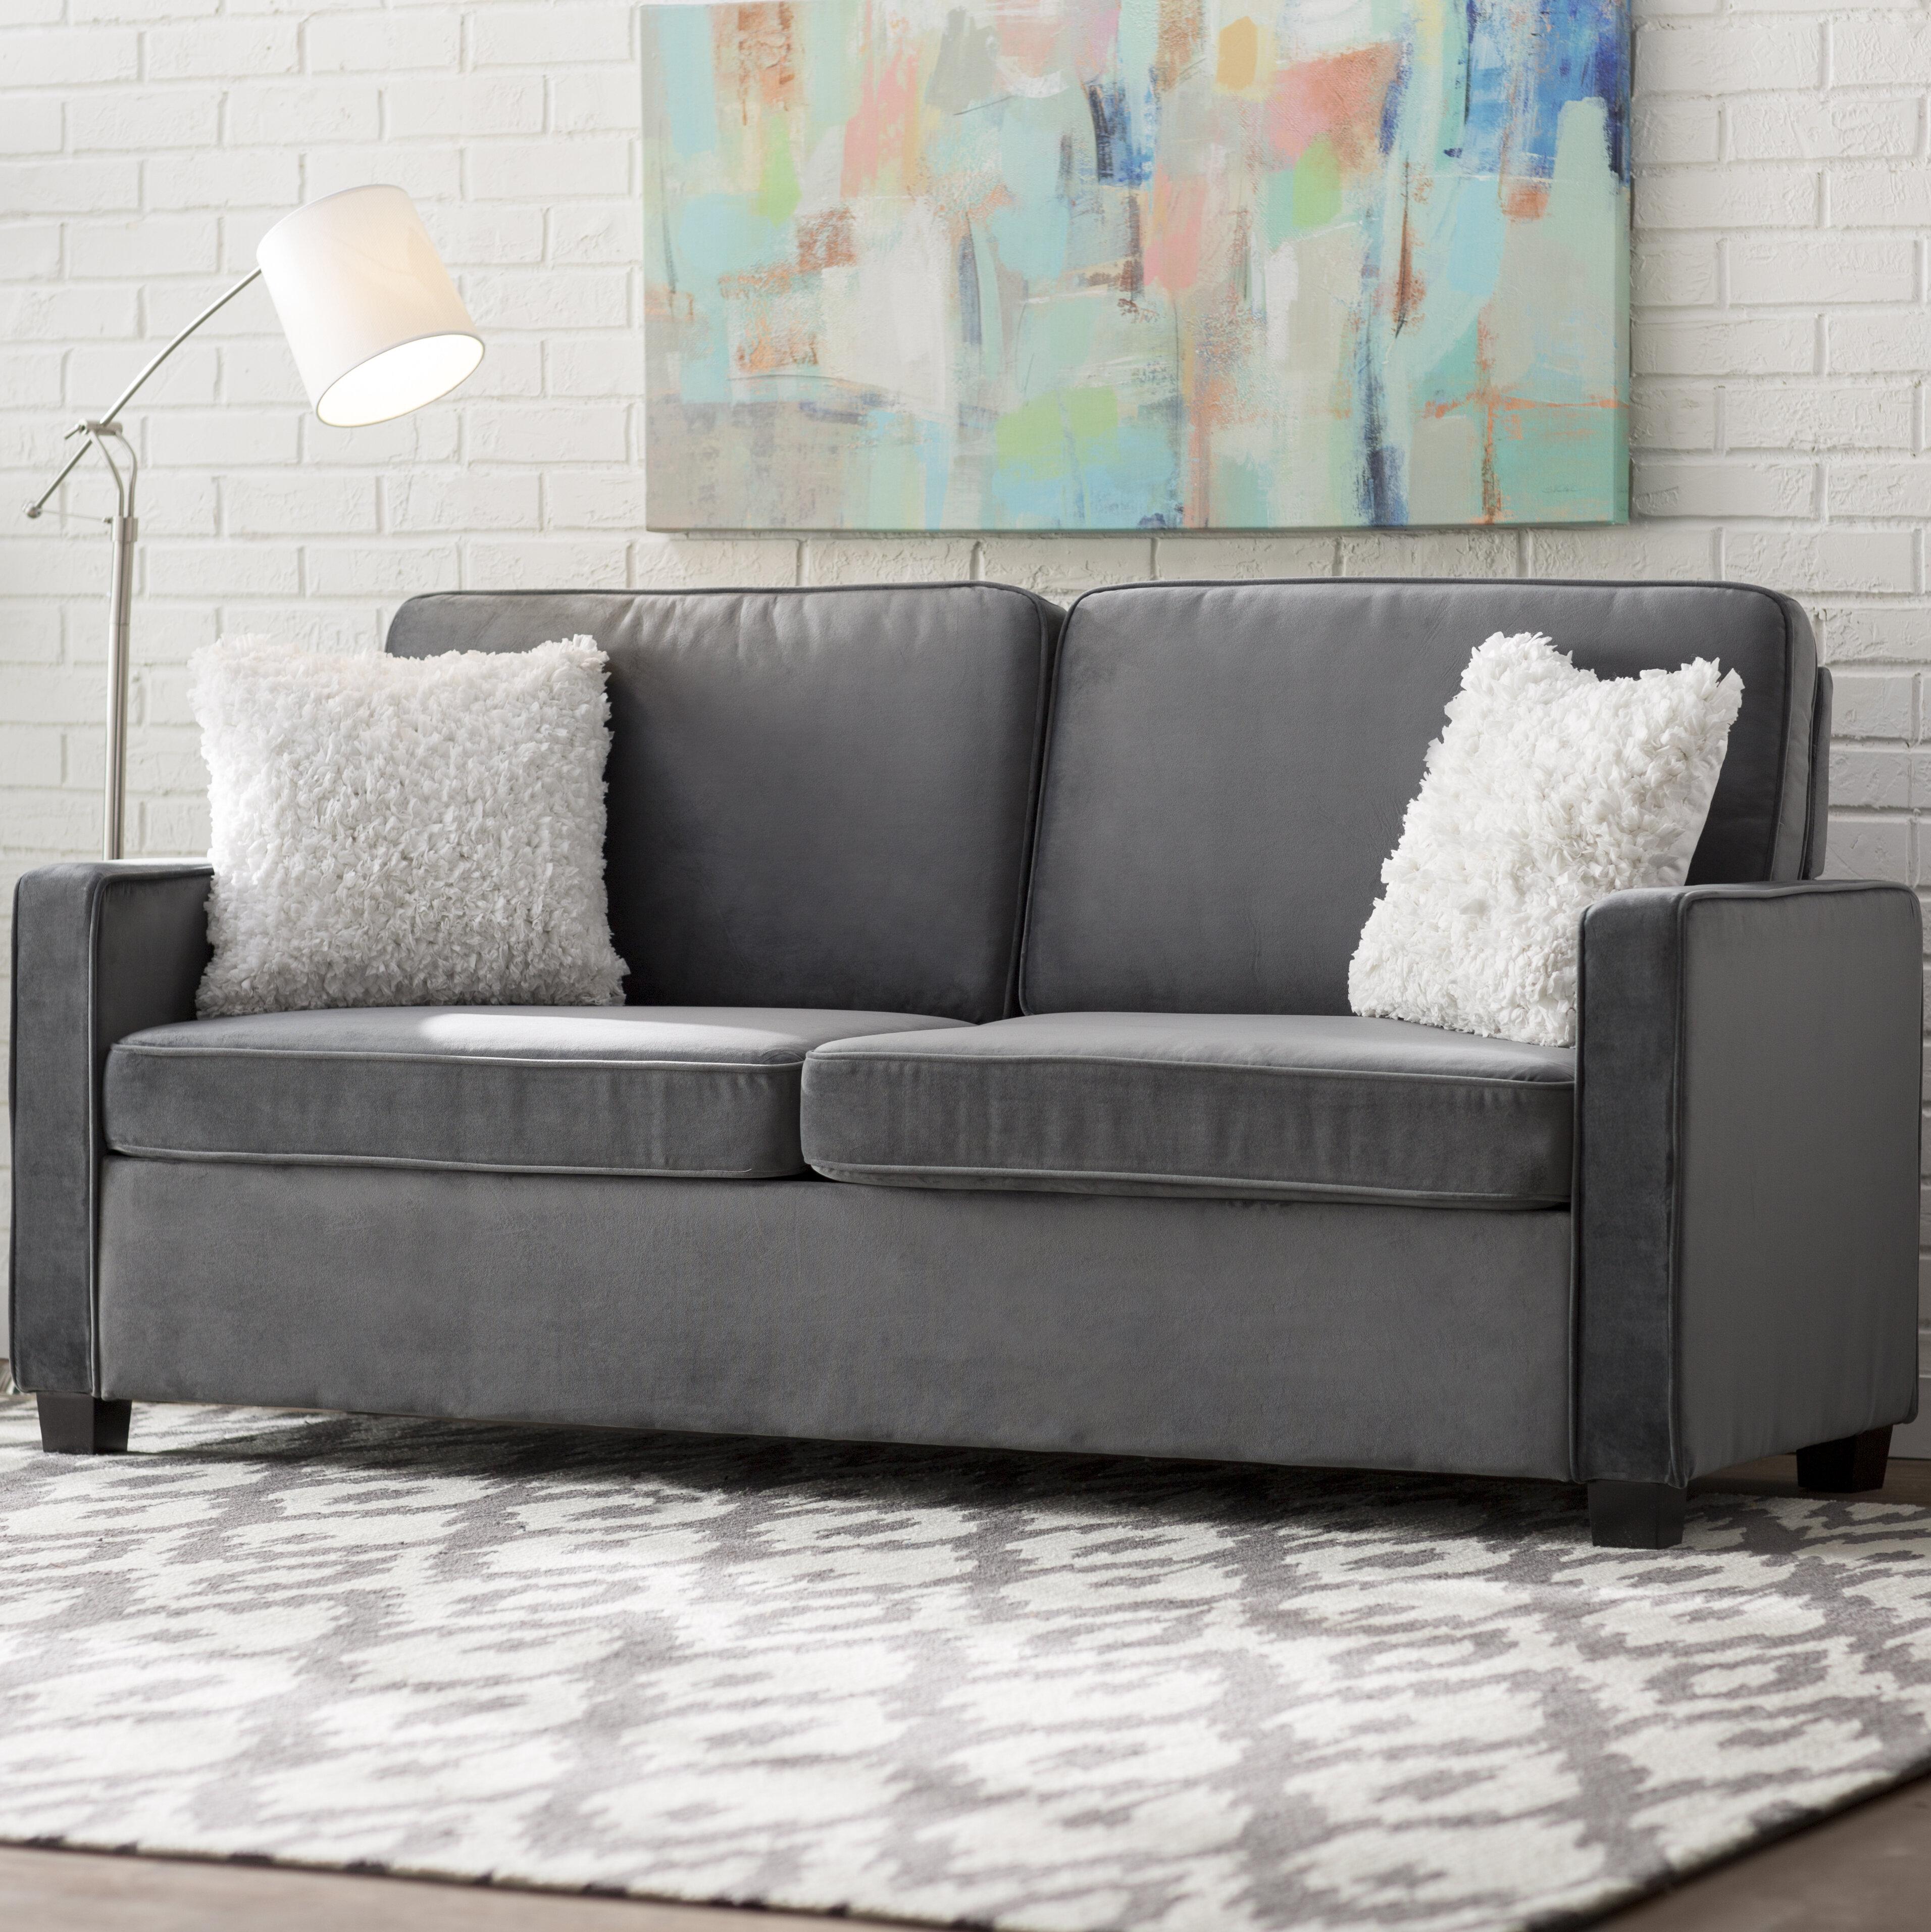 Mercury Row Cabell Sleeper Sofa U0026 Reviews | Wayfair